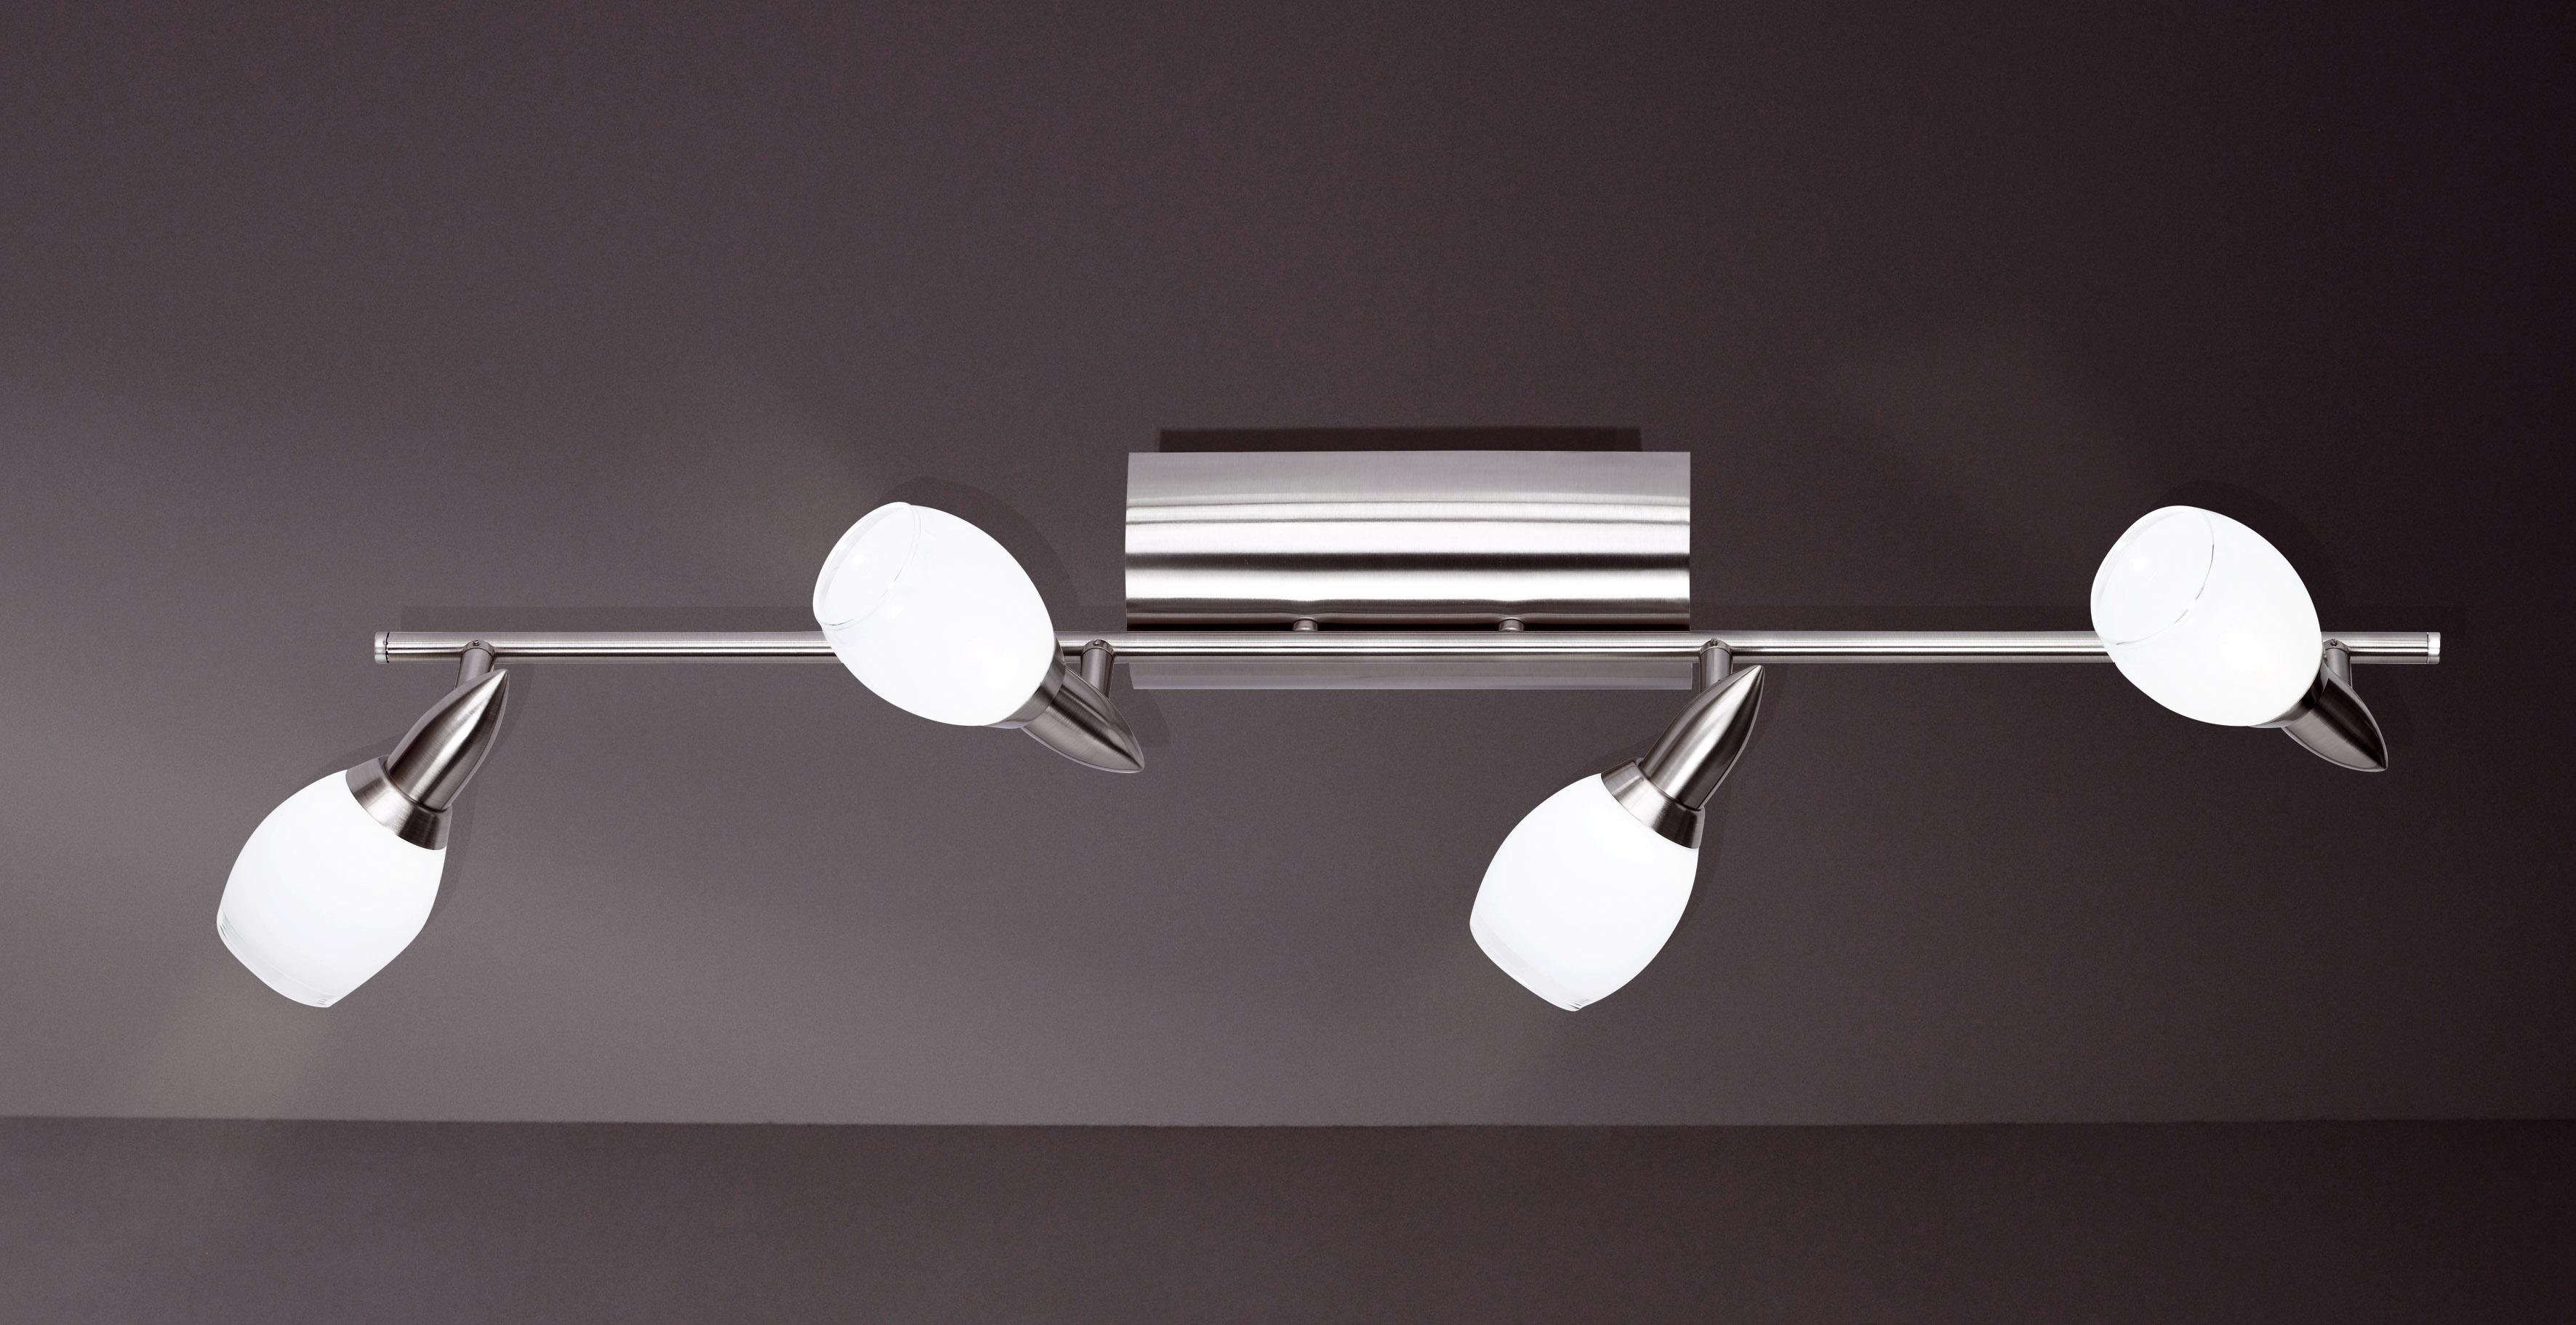 Wofi Spotové svítidlo MAURO 4x LED 5 W matný nikl WO 7301.04.64.0000